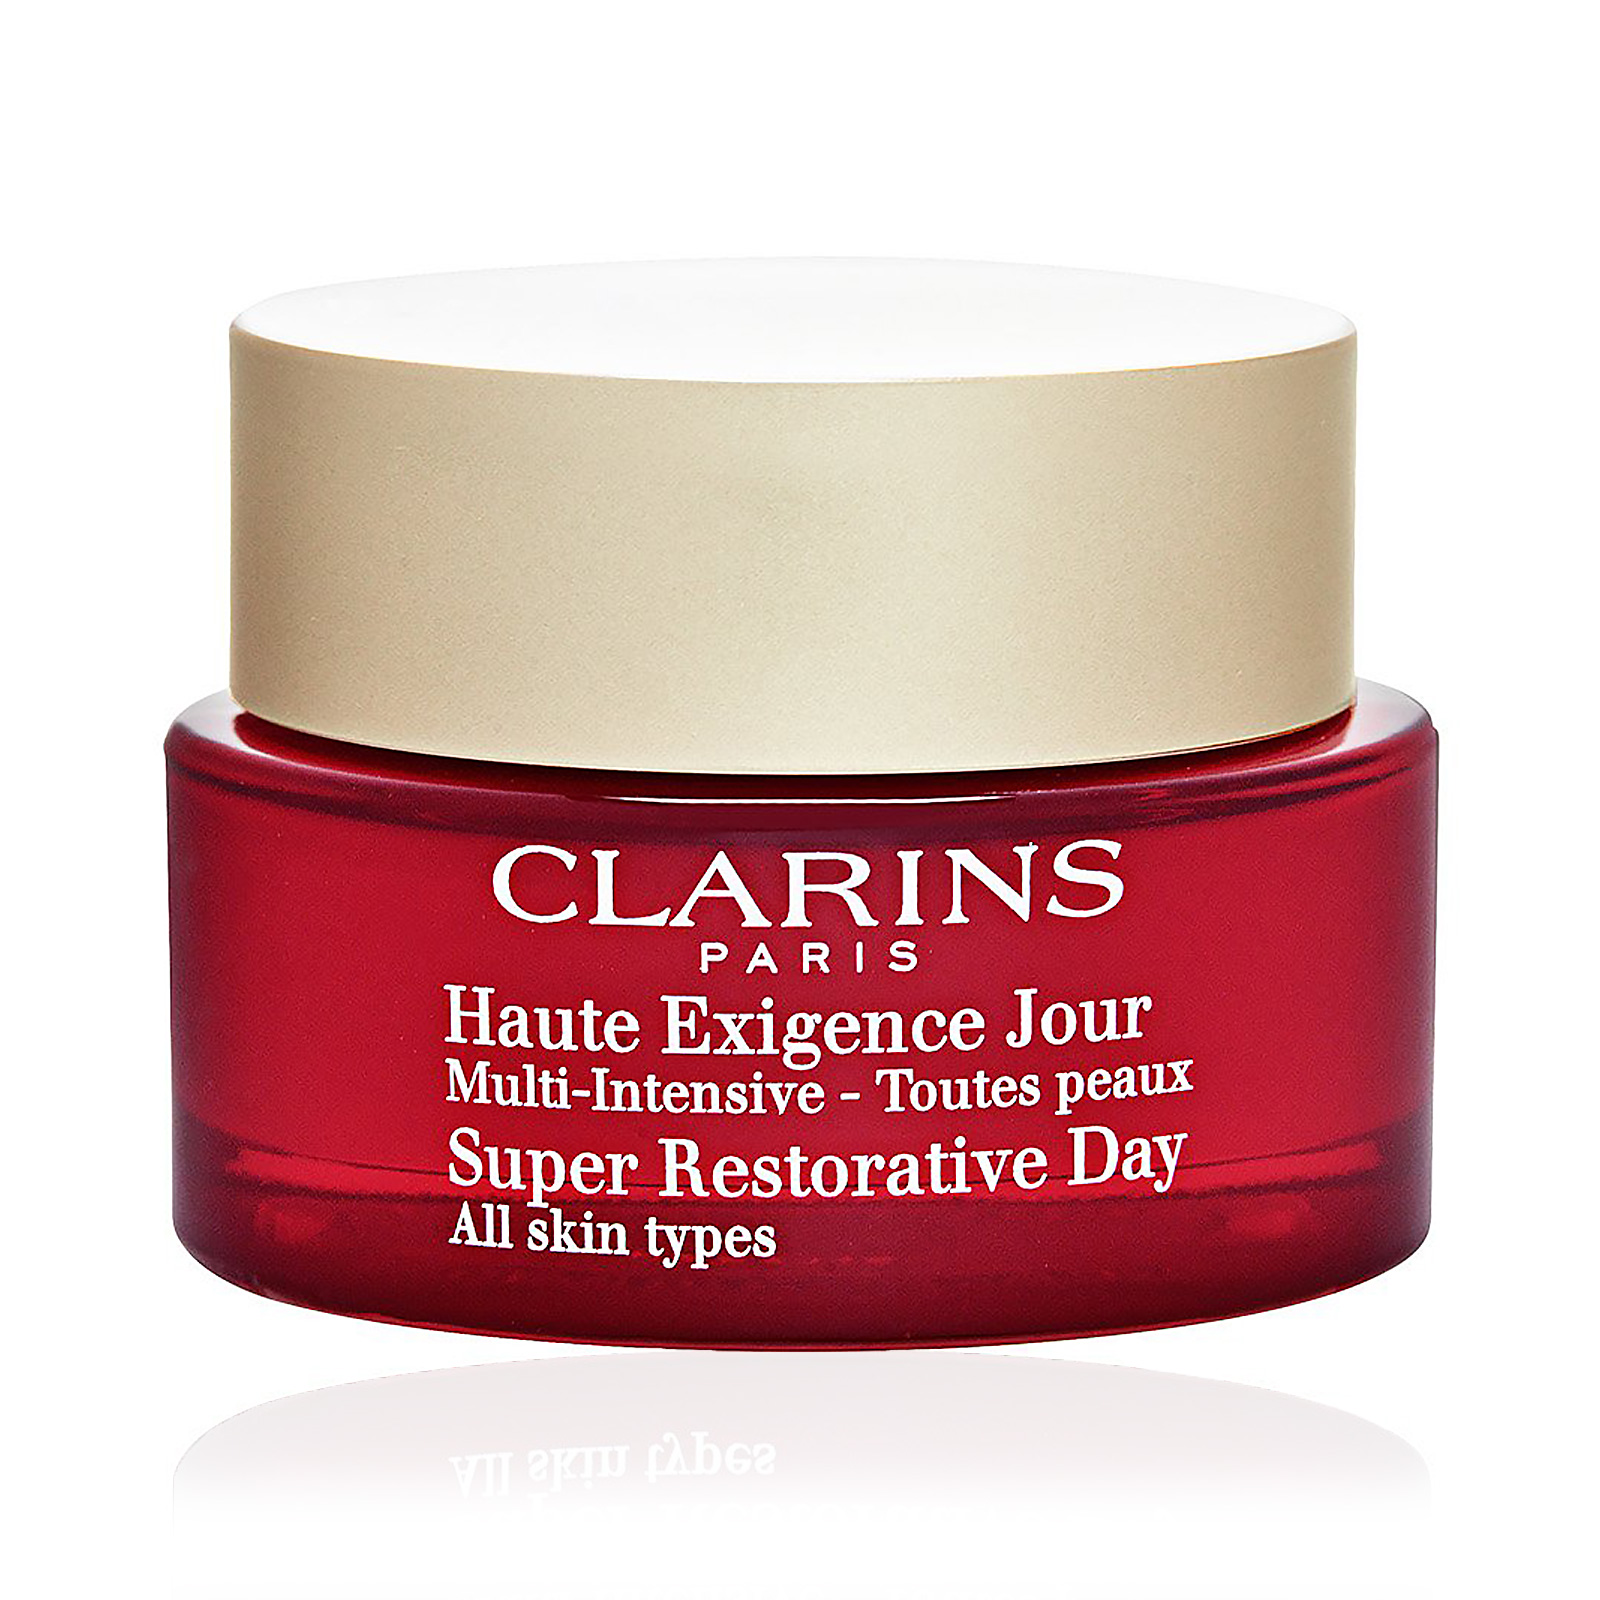 Super Restorative Day Cream (All Skin Types)